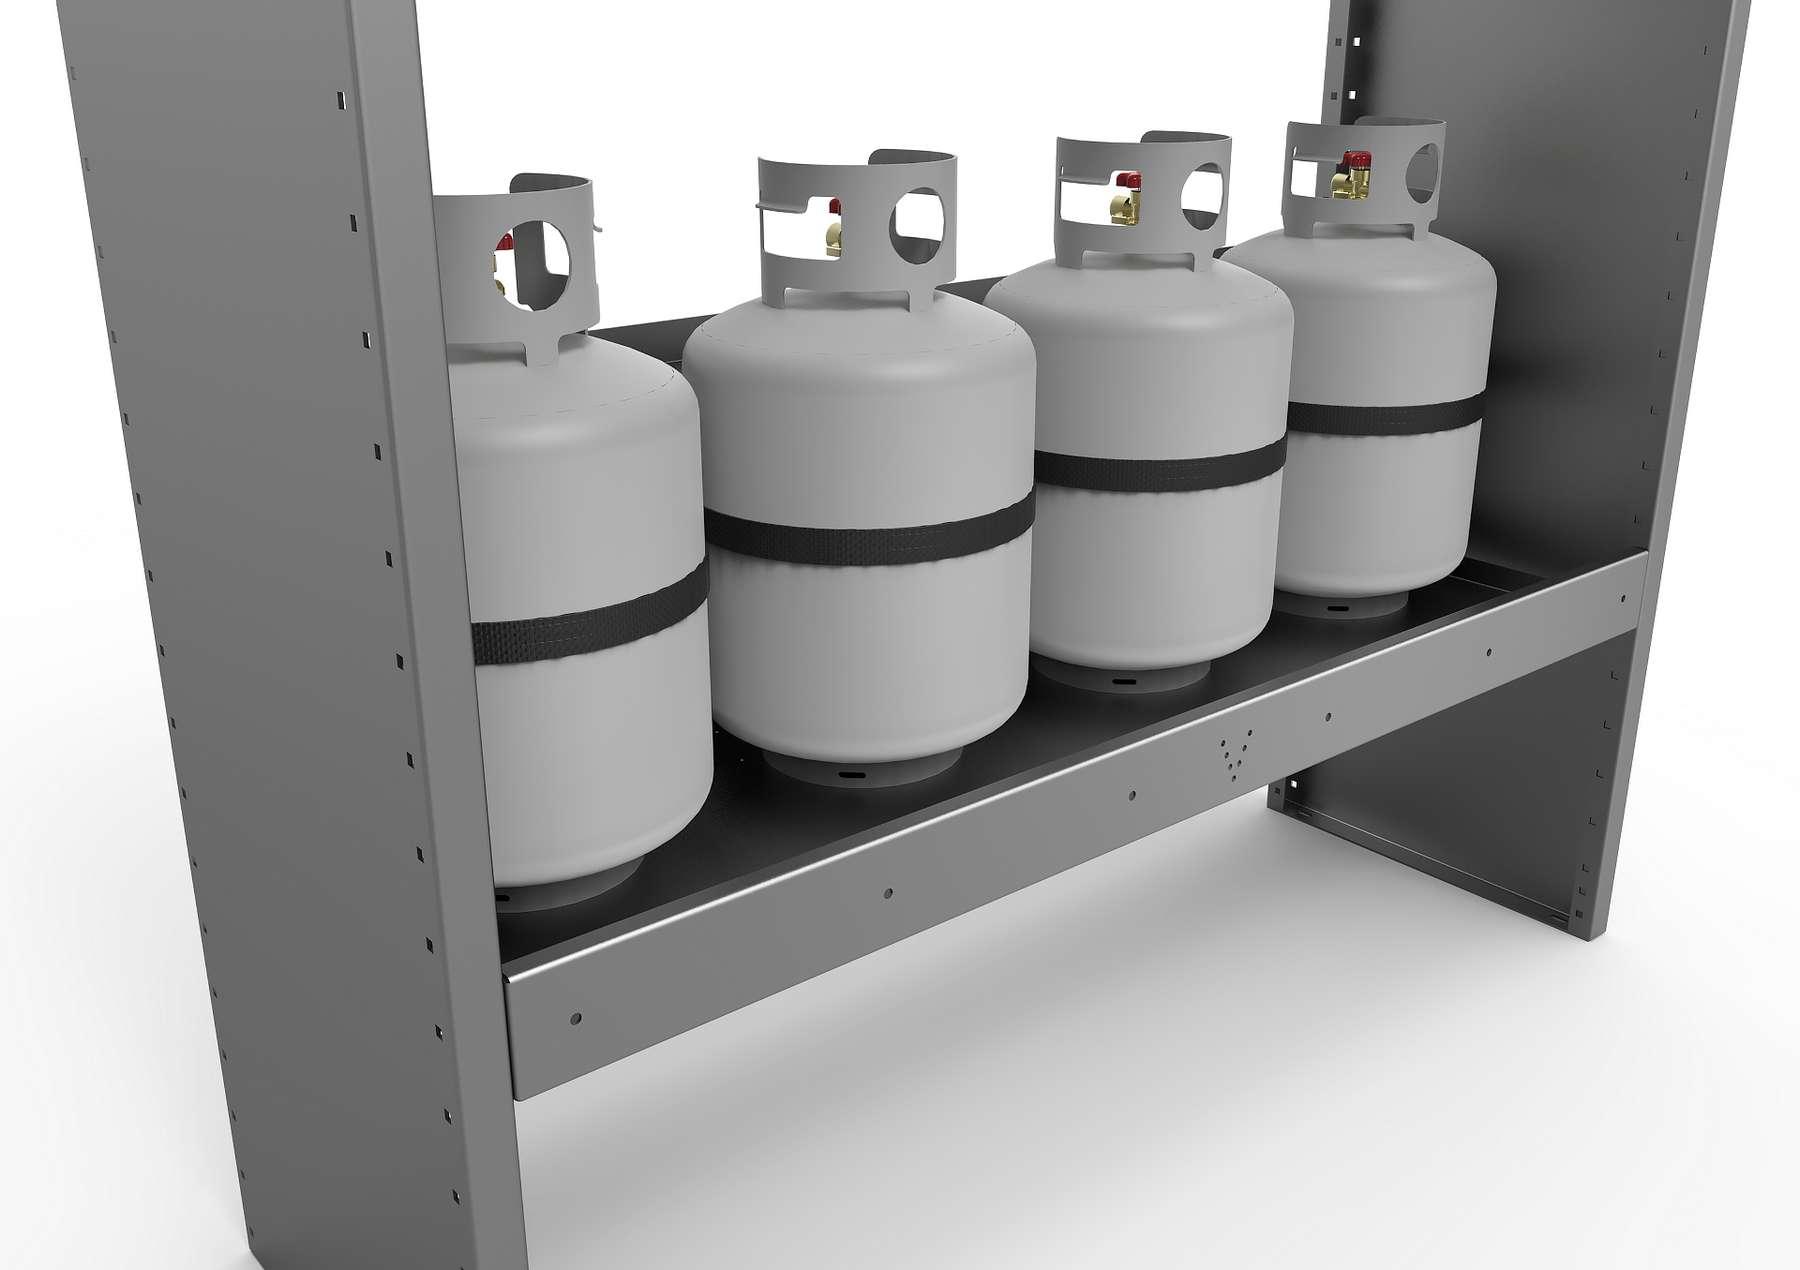 HORIZONTAL GAS BOTTLES SUPPORT